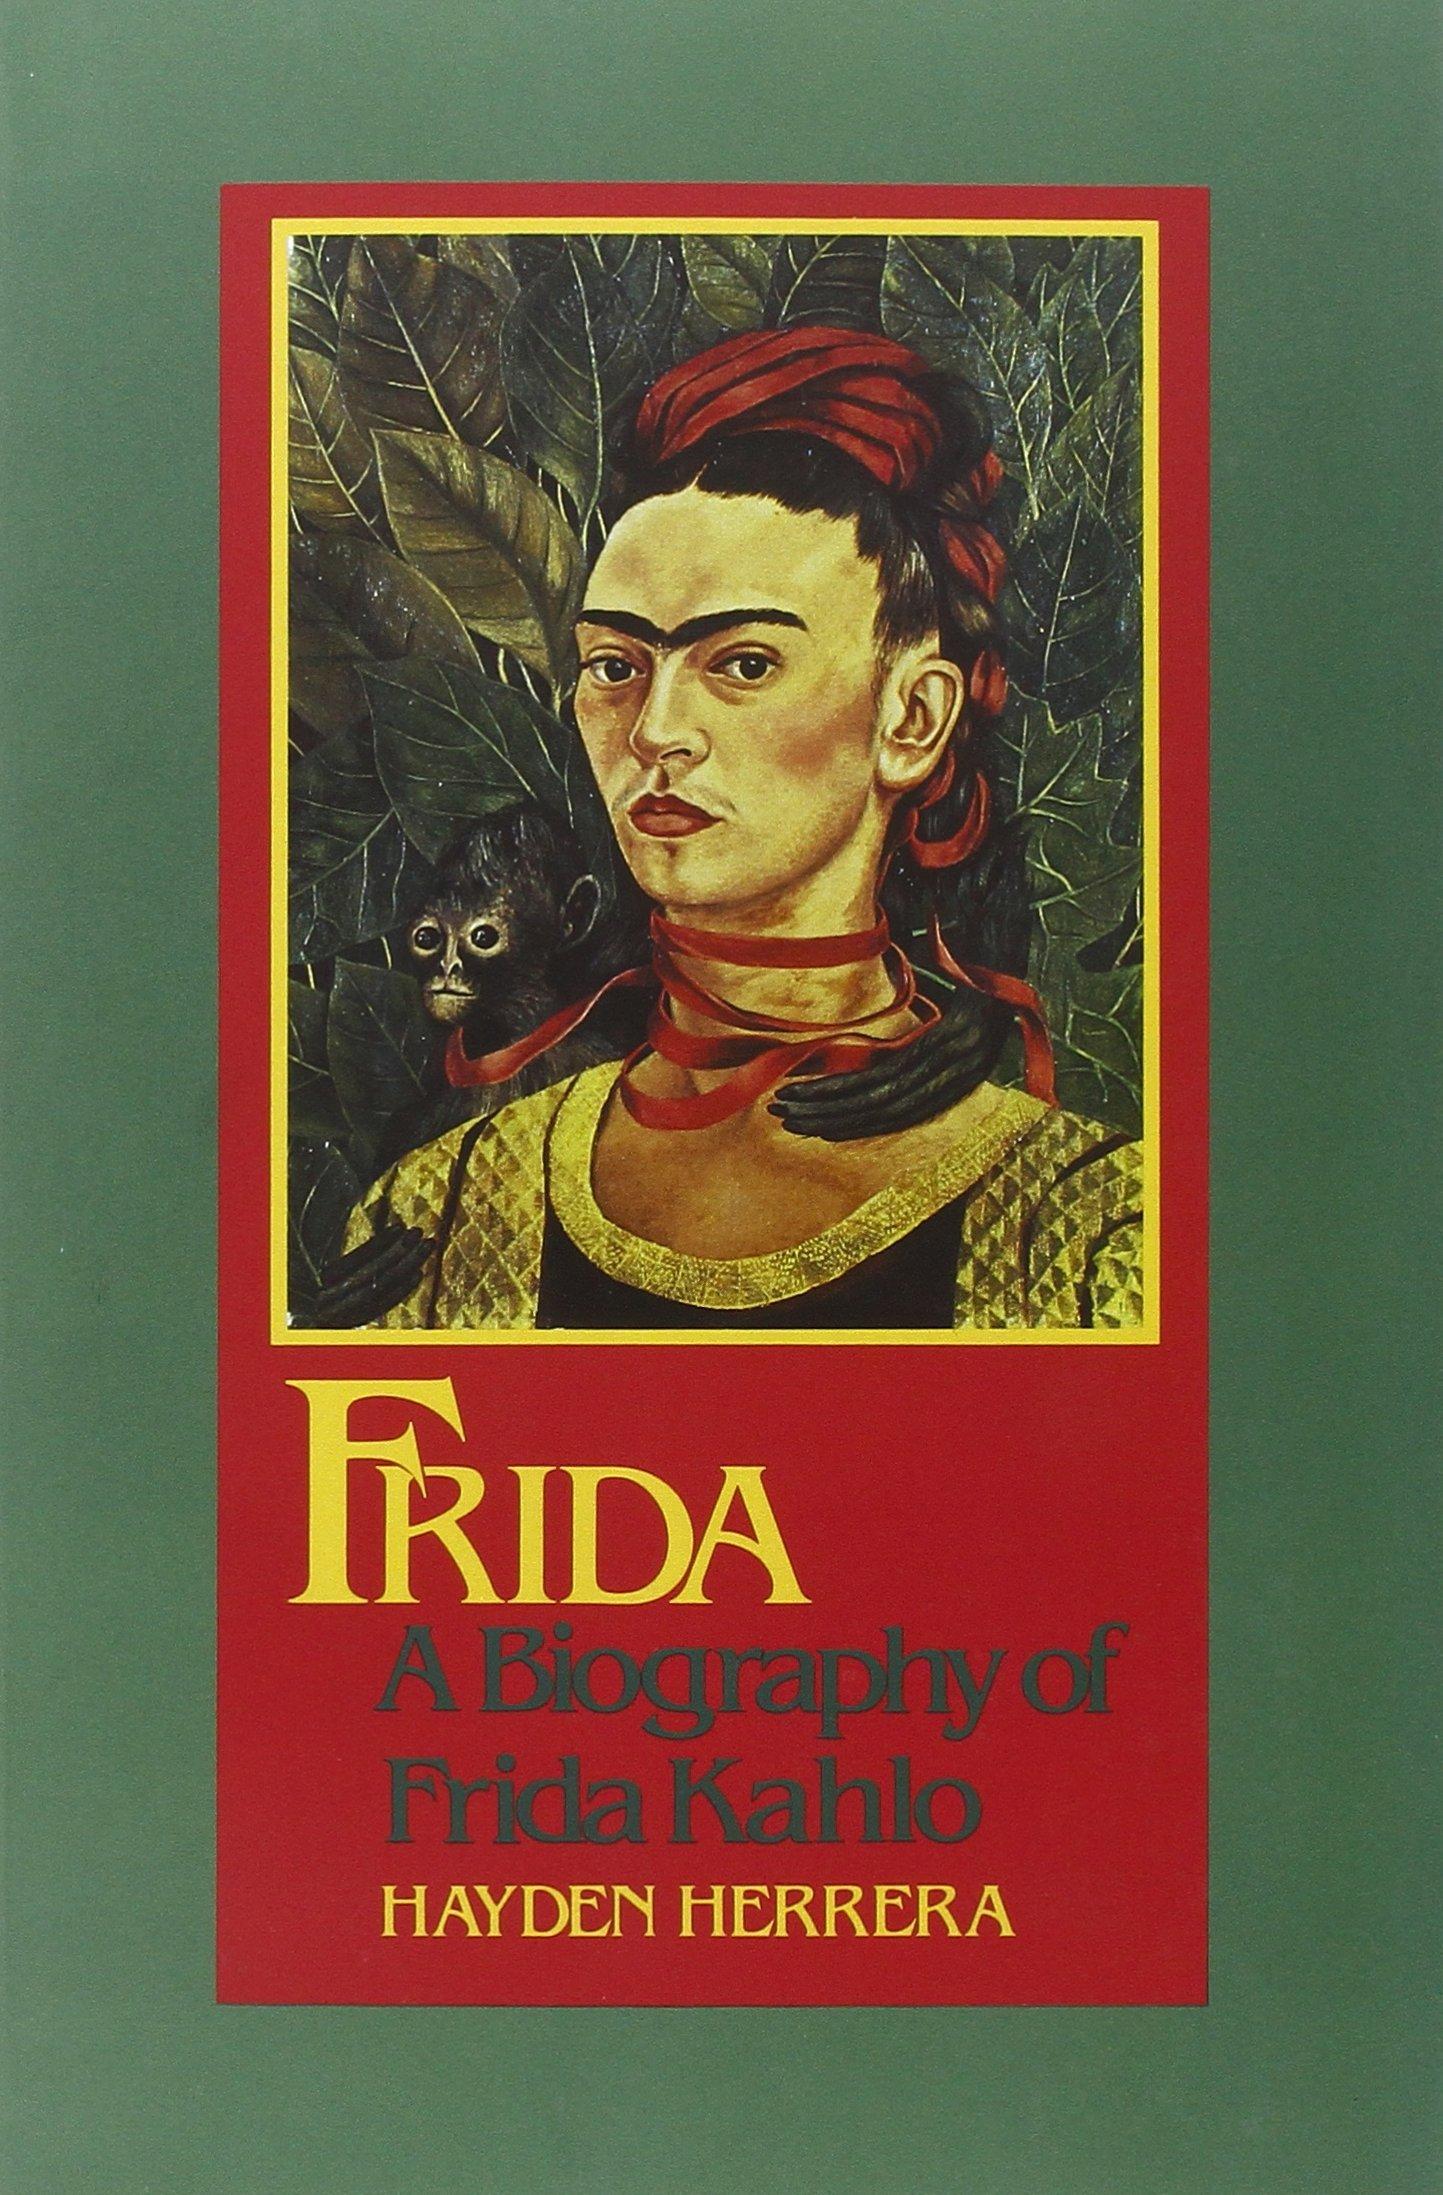 frida kahlo biography book